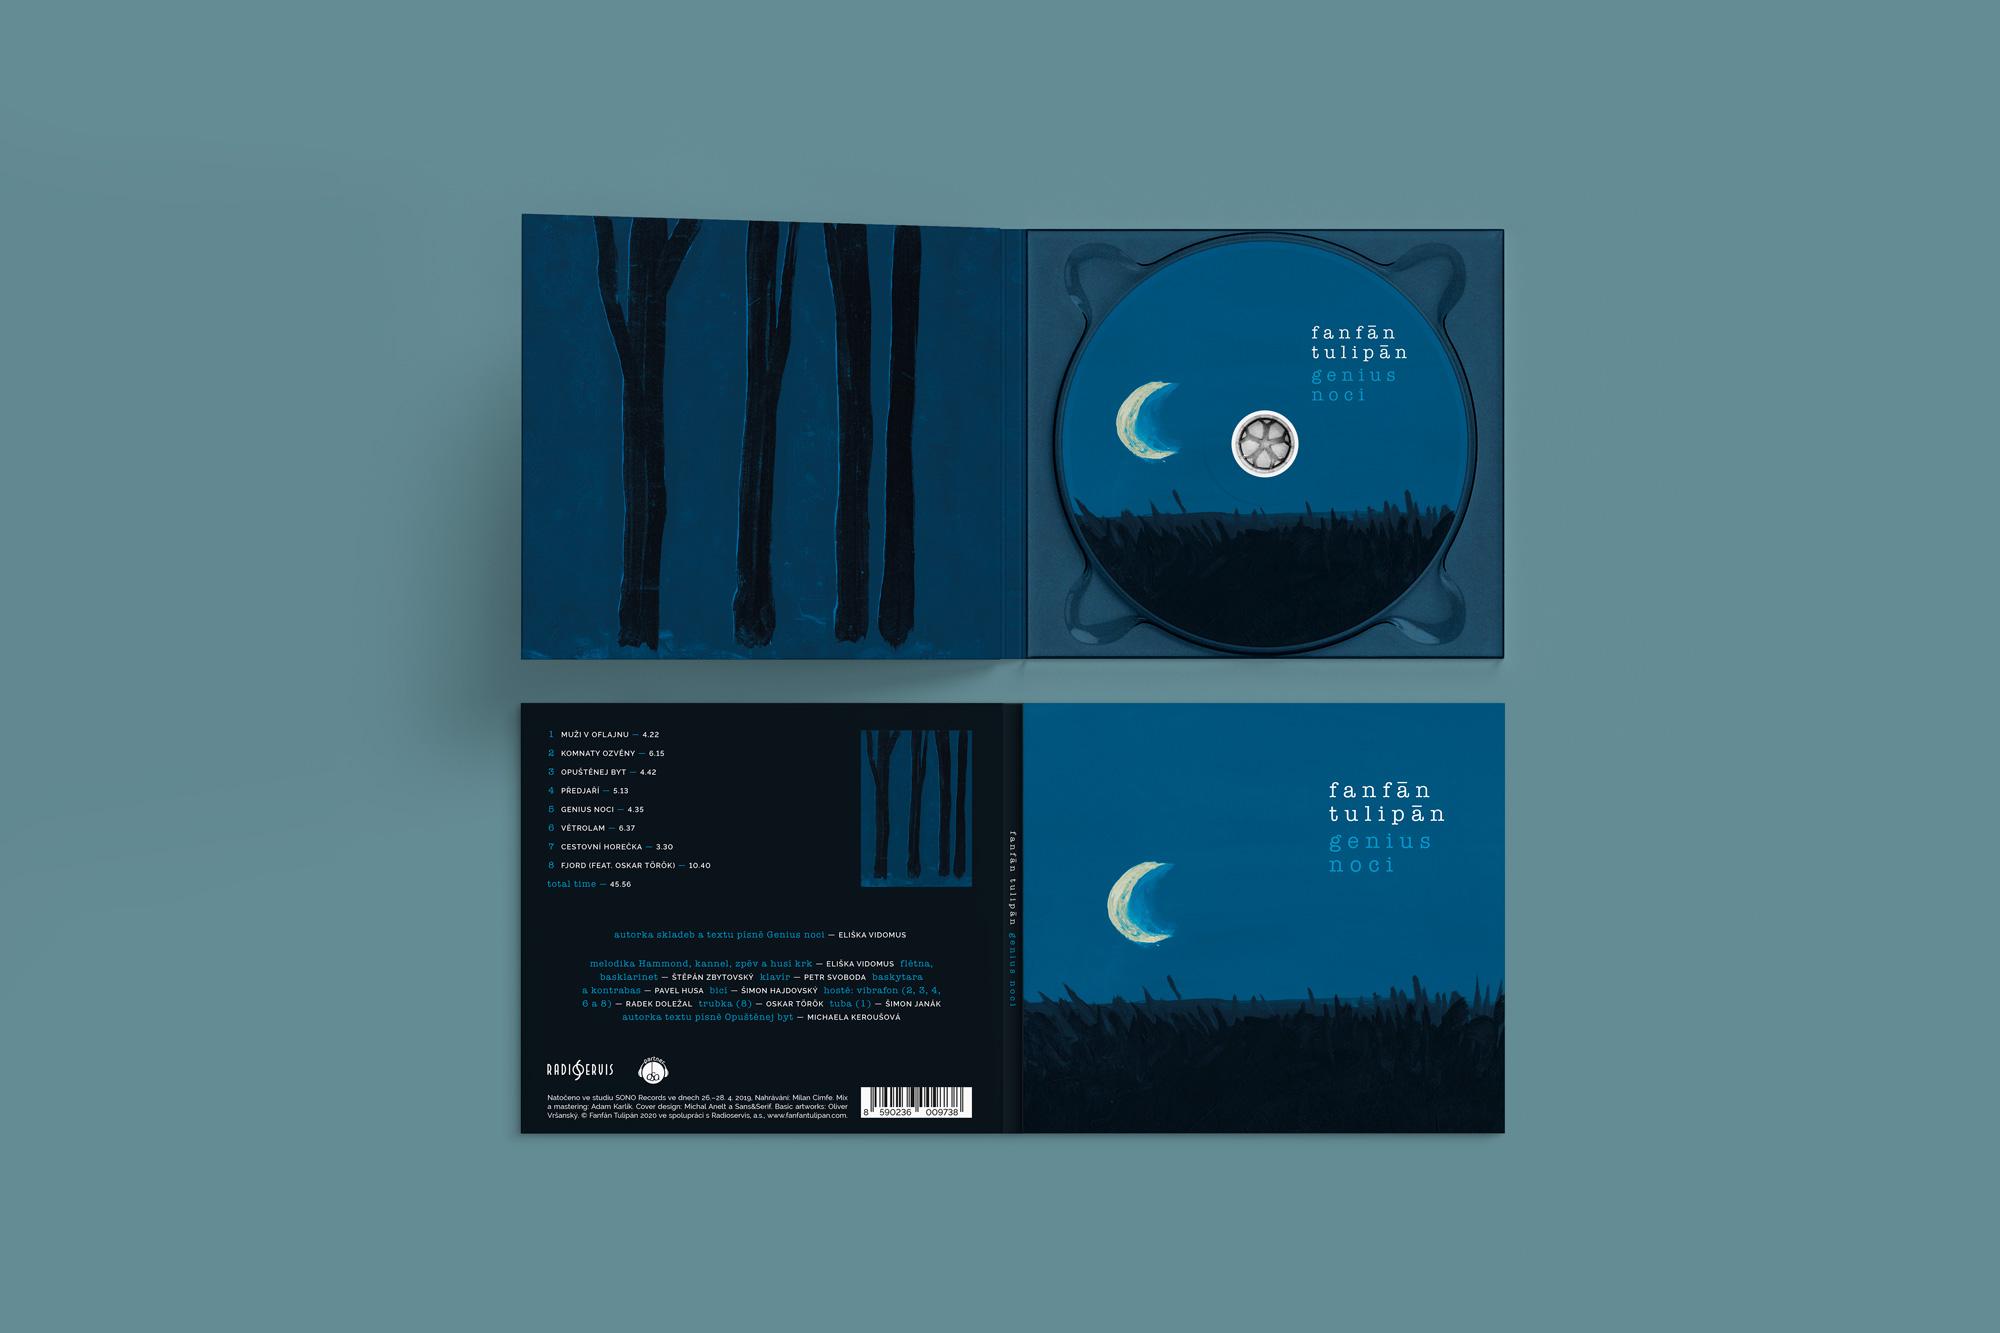 [album/Products_Model_Product/128/Fanfan_CD.jpg]